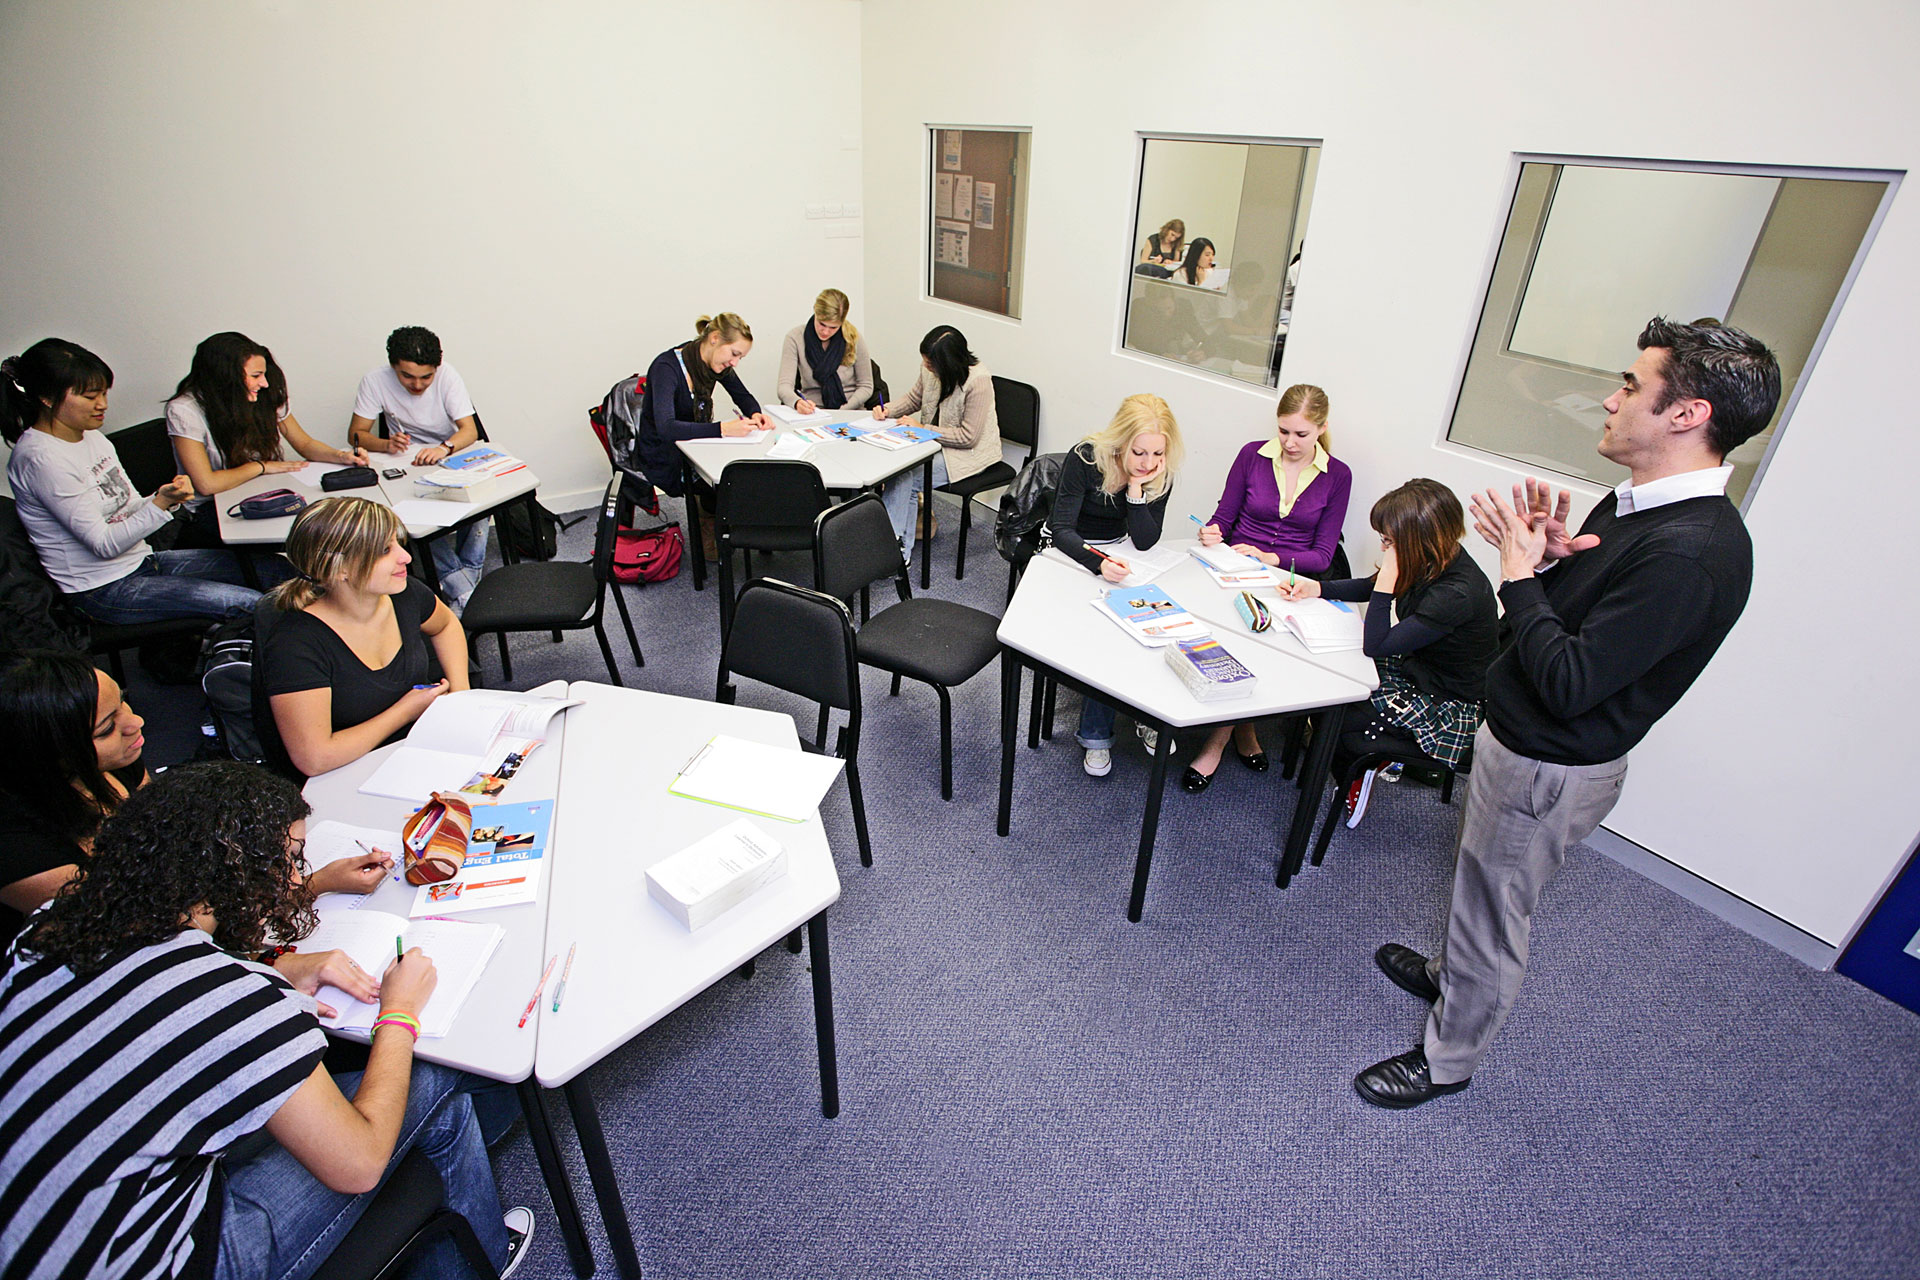 classroom-elc-sydney